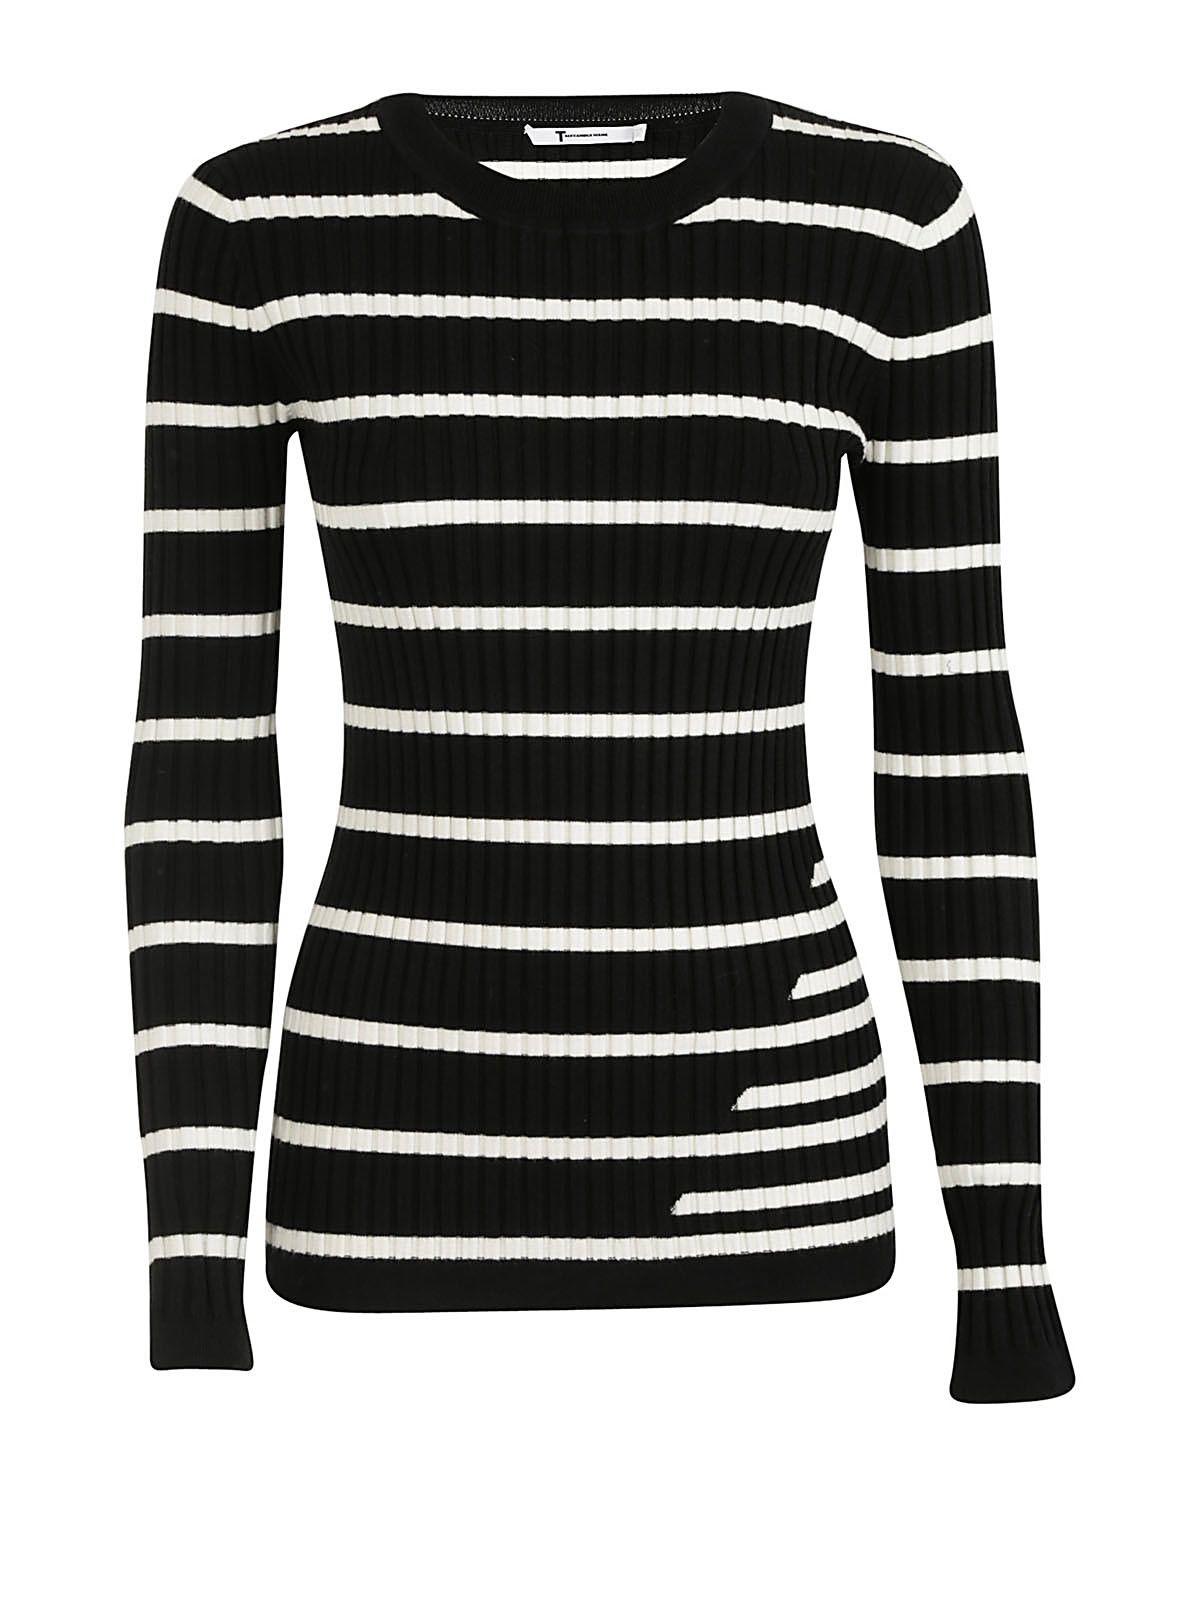 Alexander Wang Striped Knit Sweater